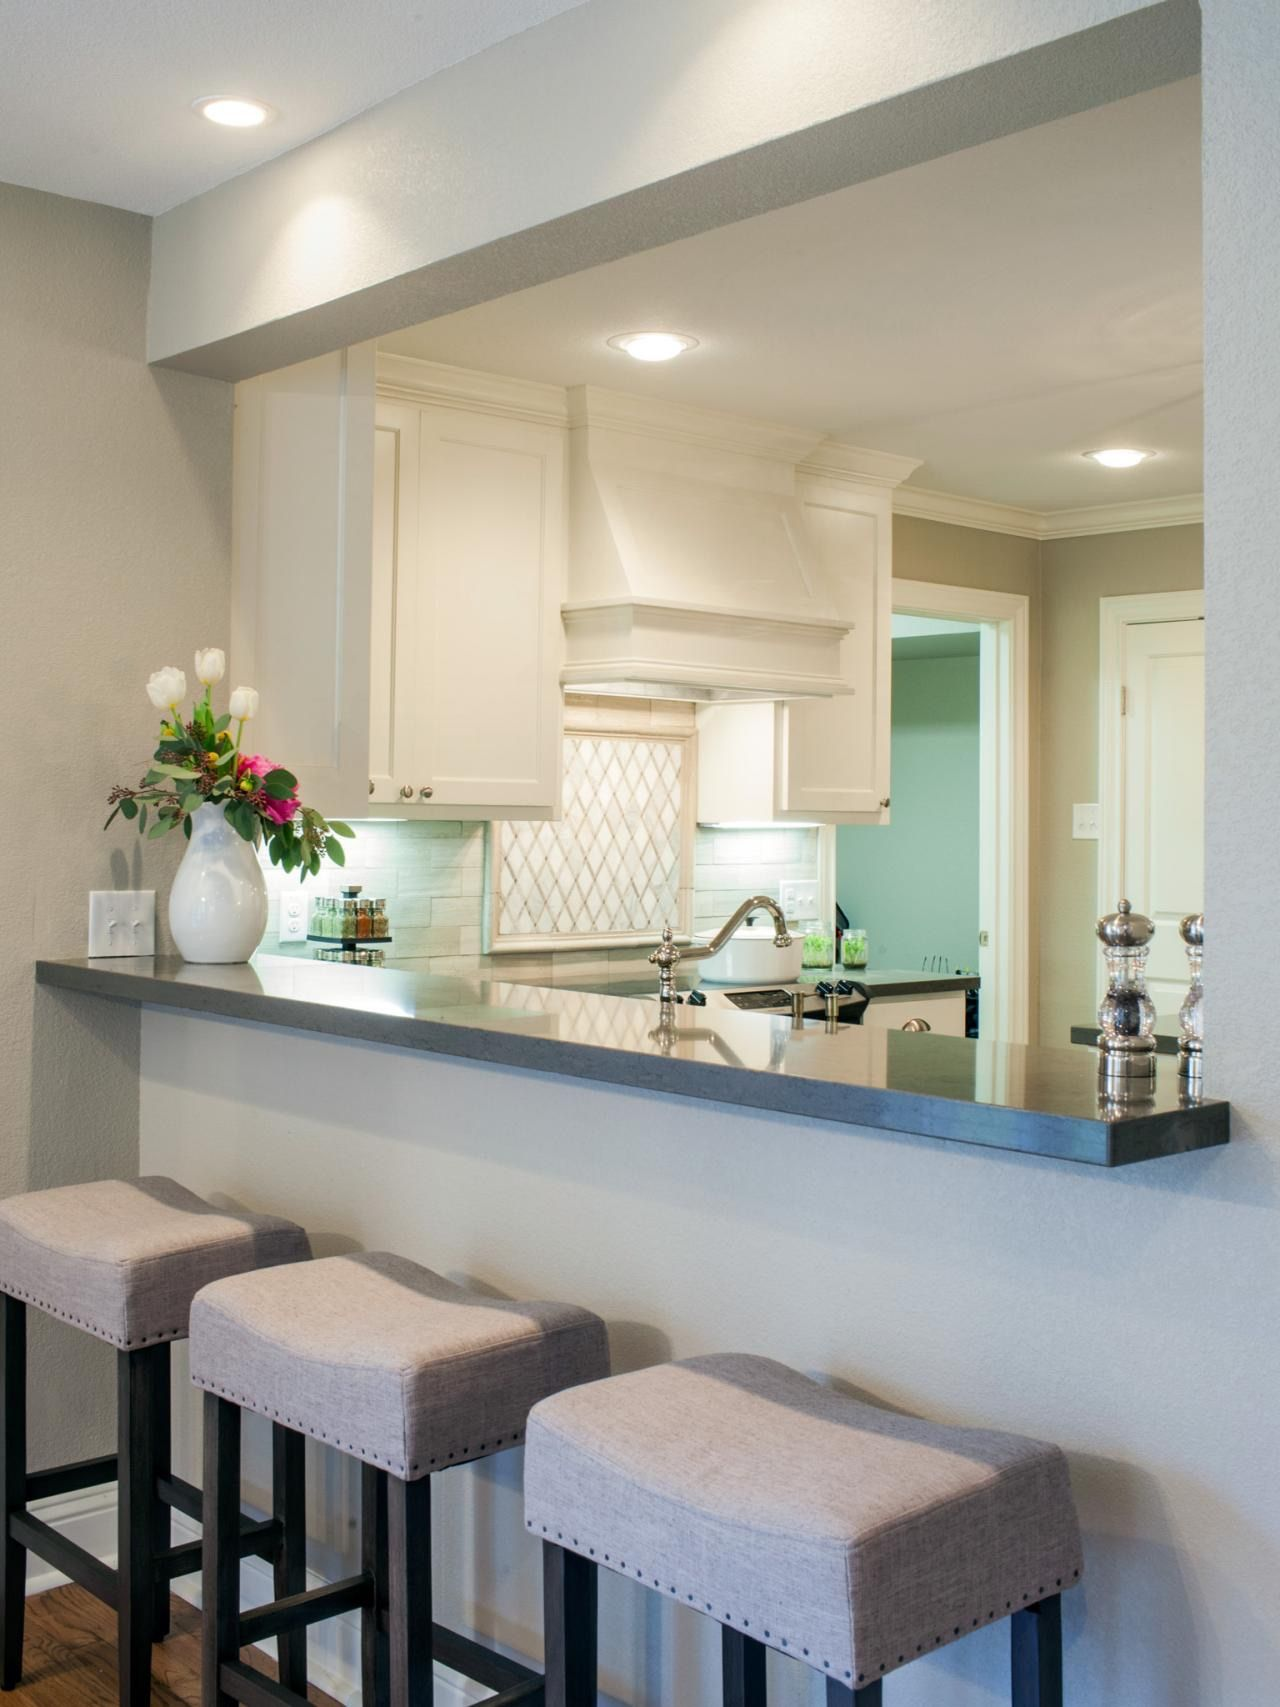 Bancone Bar Per Casa cocina sin quitar los bordes (com imagens) | cozinhas